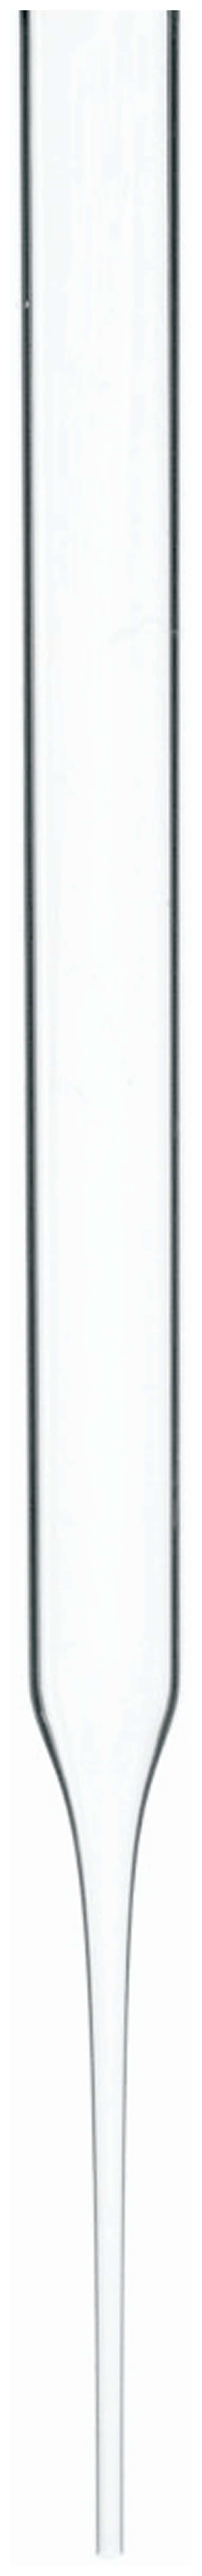 DWK Life SciencesWheaton Disposable Pasteur Pipets:Pipettes:Pasteur Pipets